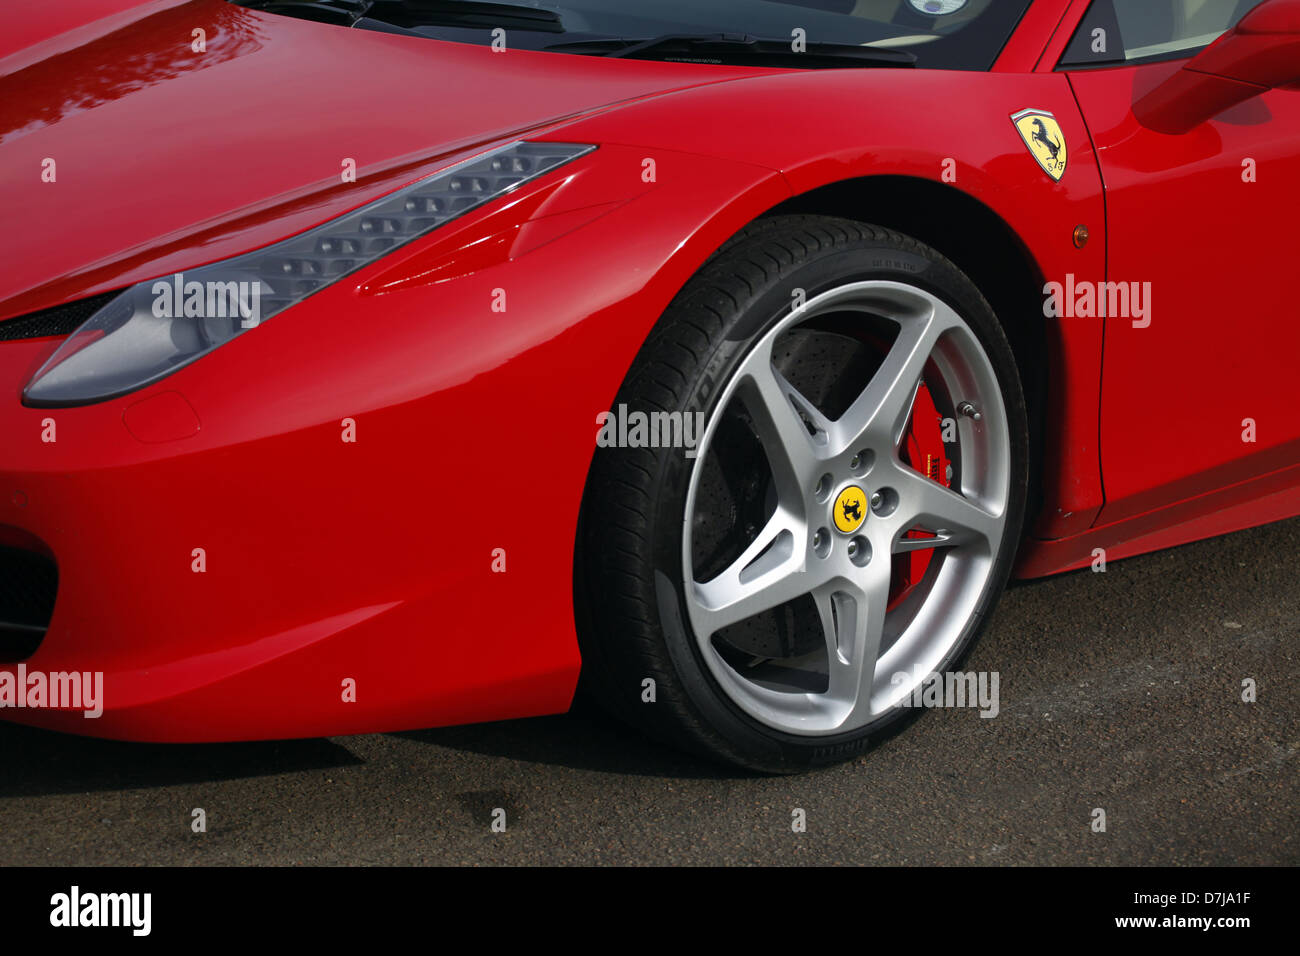 Red Ferrari 458 Italia Car Wheels North Yorkshire England 21 July Stock Photo Alamy